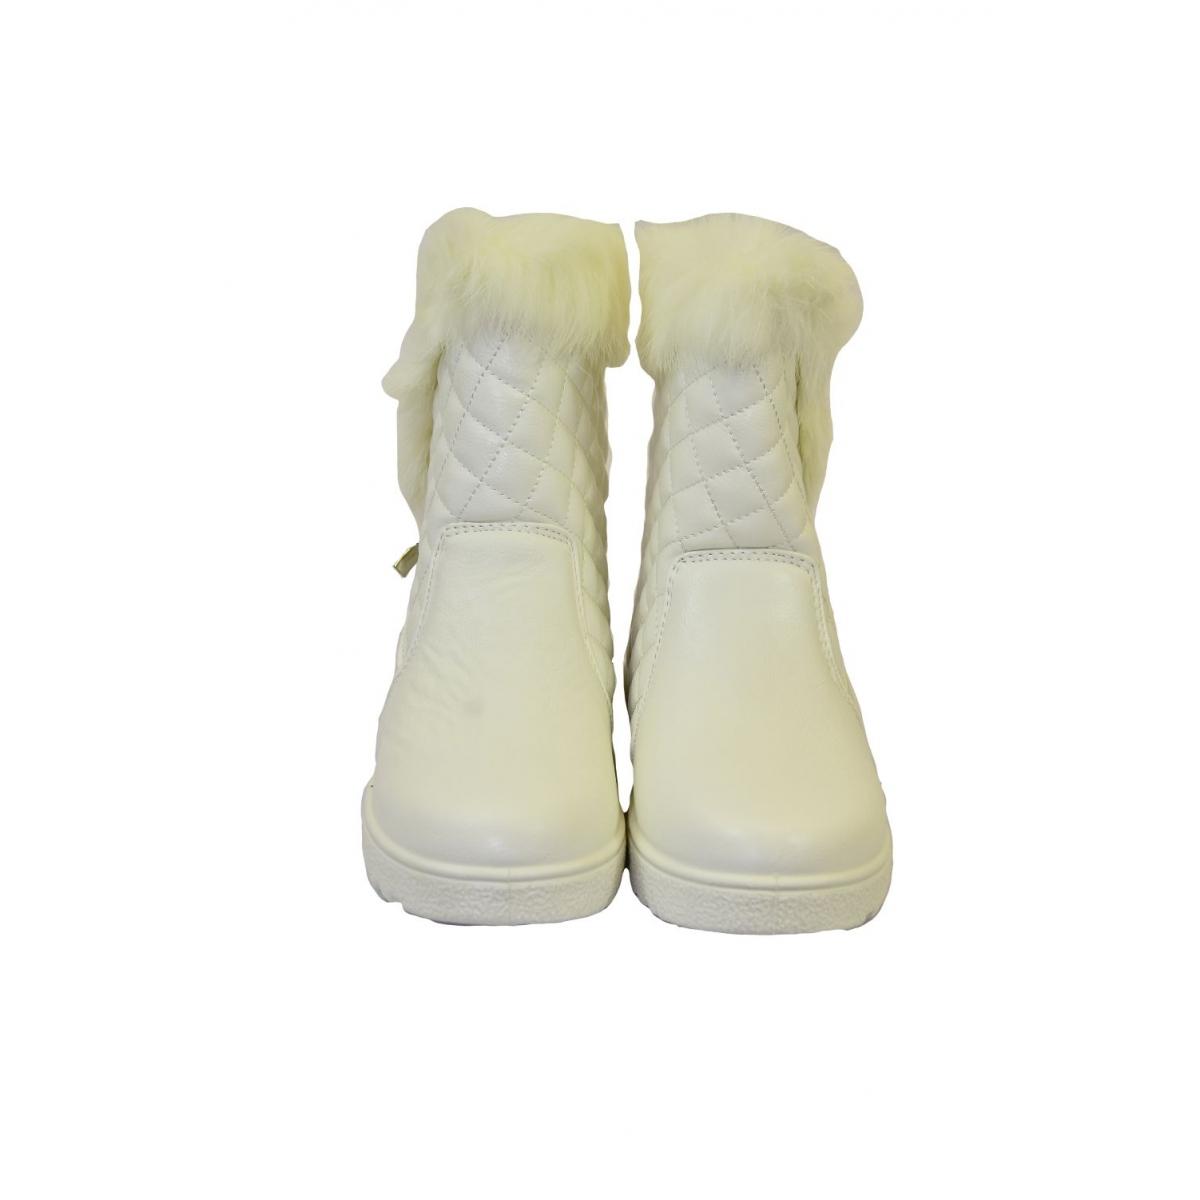 3a76a2d5e4 Dámske biele čižmy LOLLA - 3